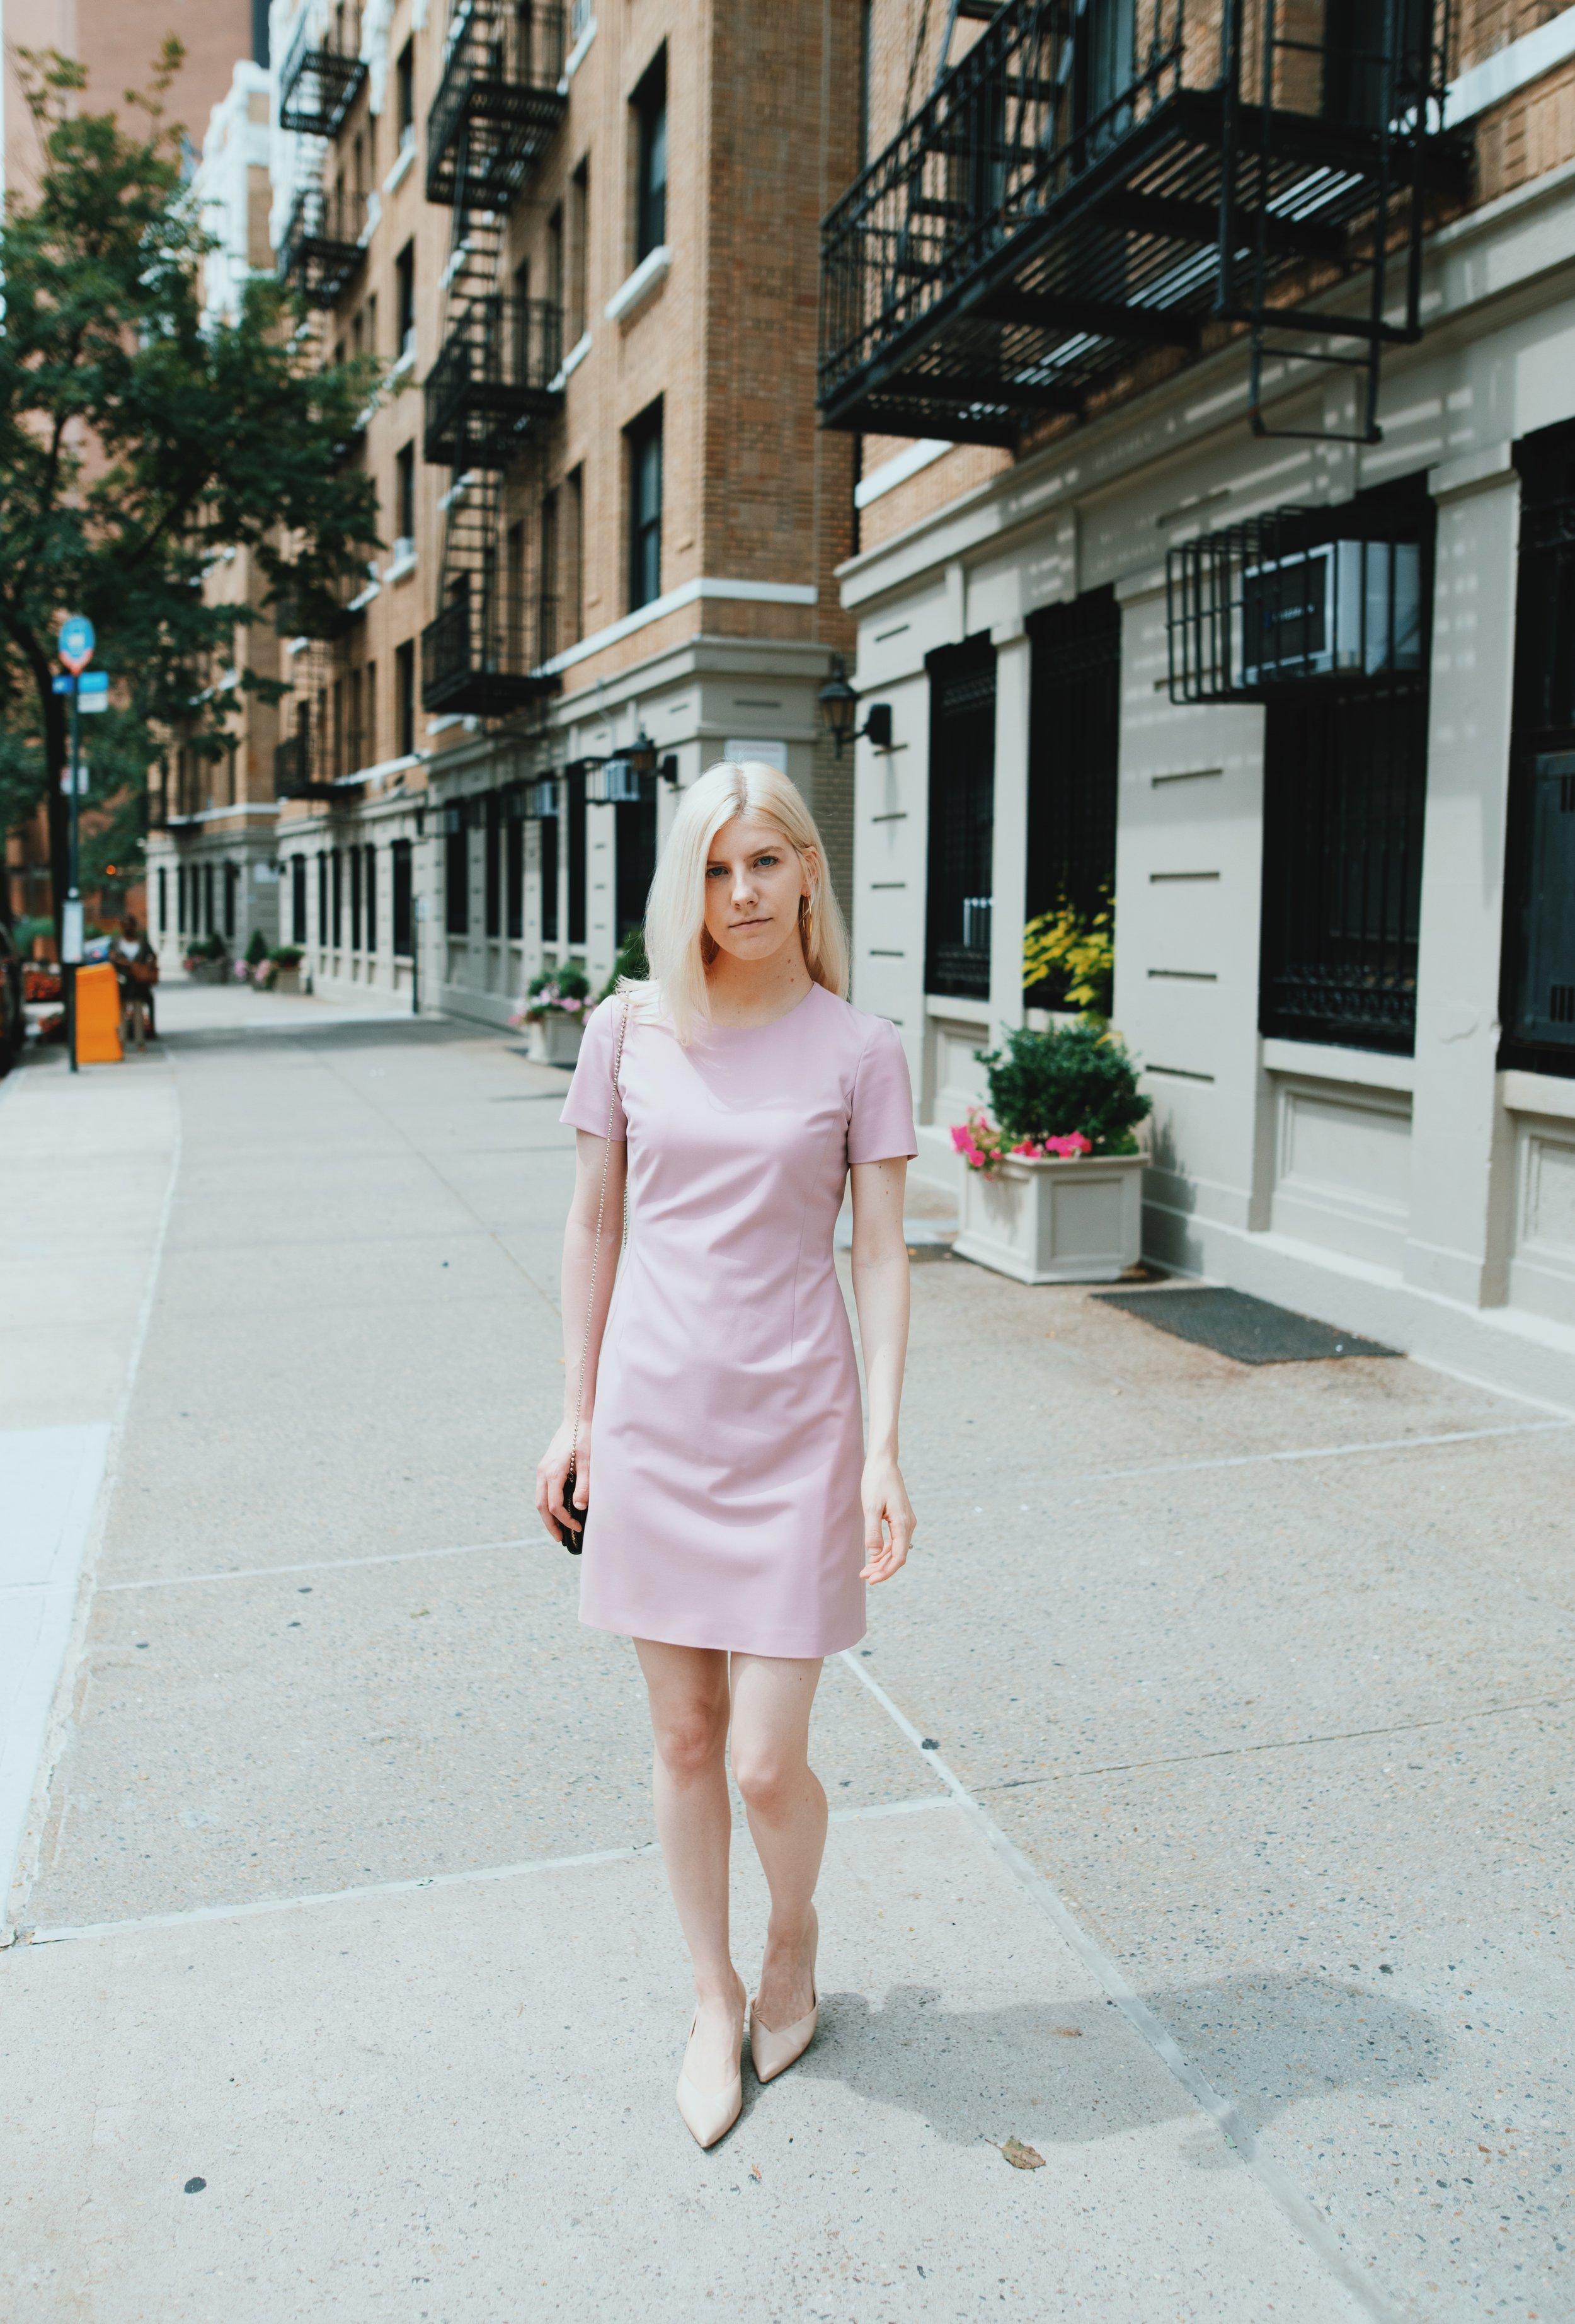 Washington Heights, Manhattan  July 2018